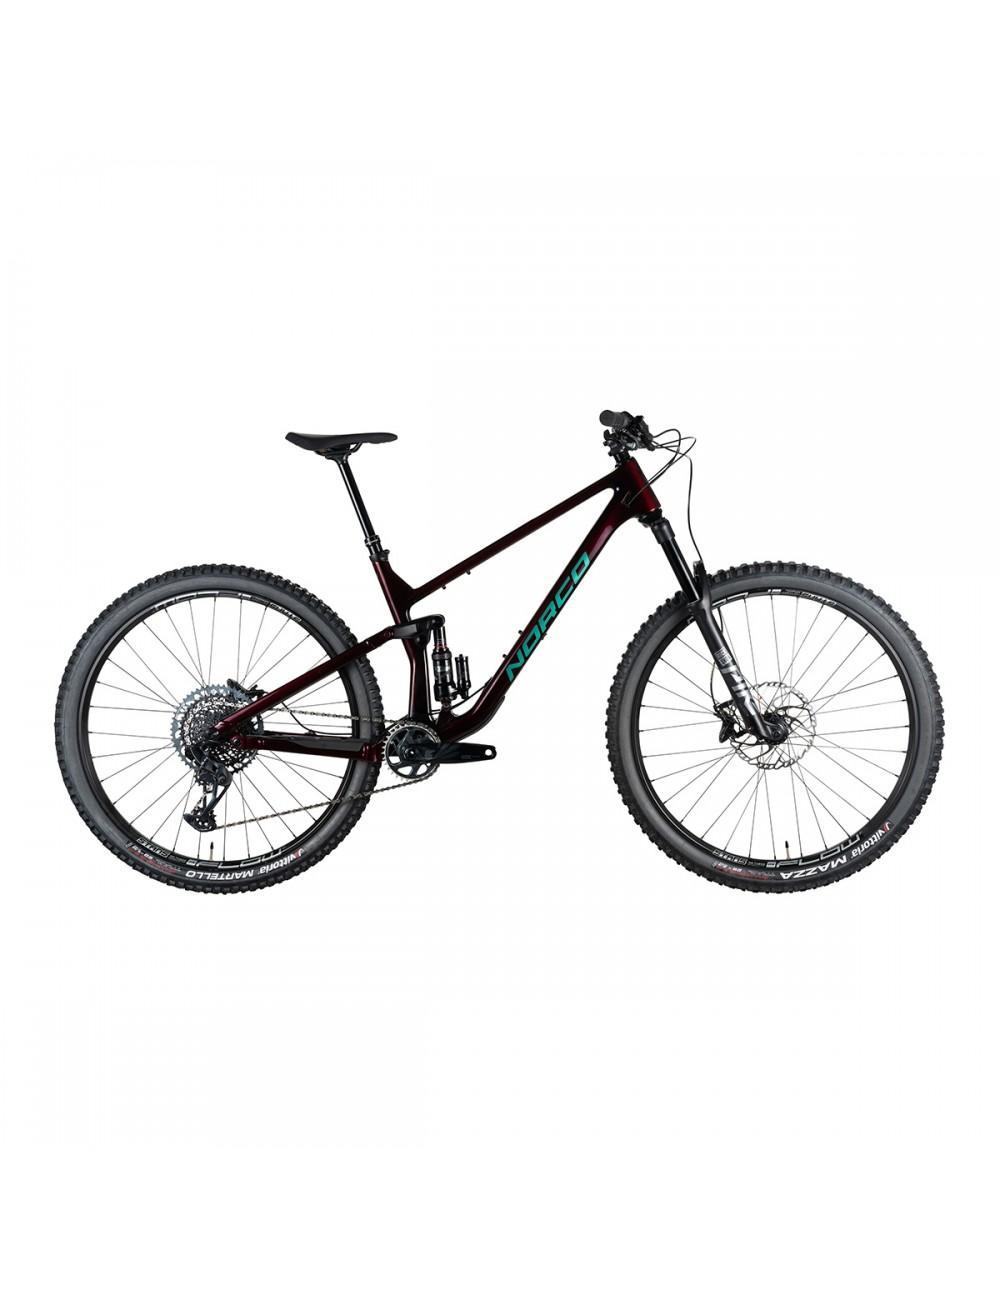 Norco Optic C9.2 Bike - Red/Green_13335